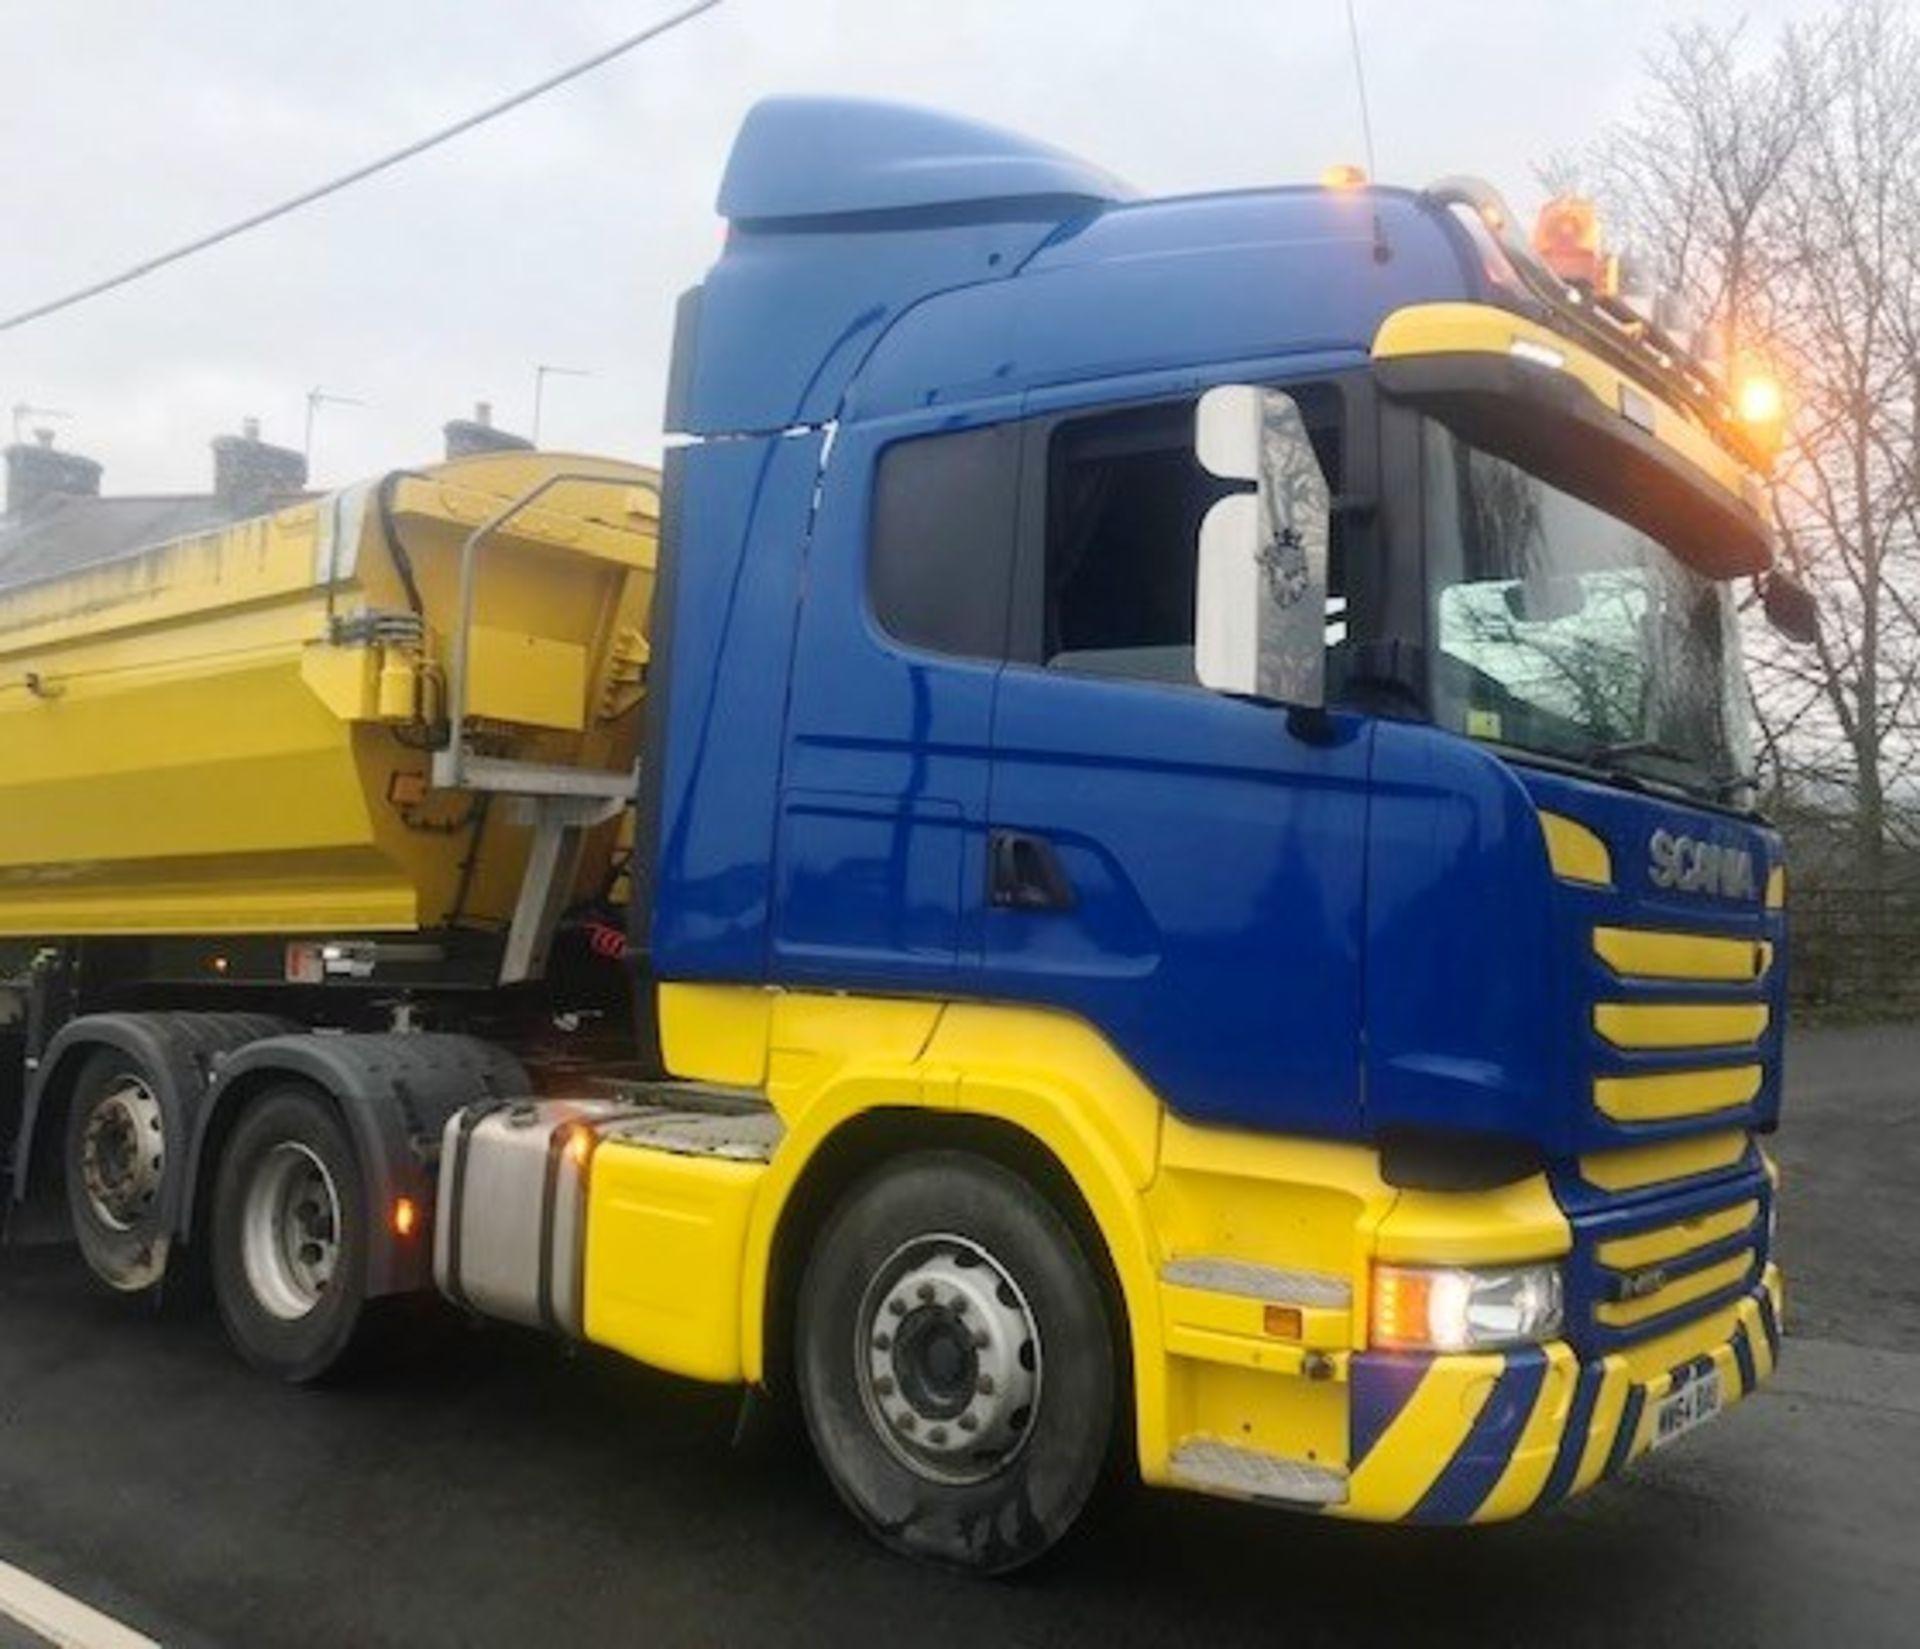 Lot 7 - 2015 | Scania R450 LA 6x2 Sleeper Cab | 330,000km - TRAILER NOT INCLUDED